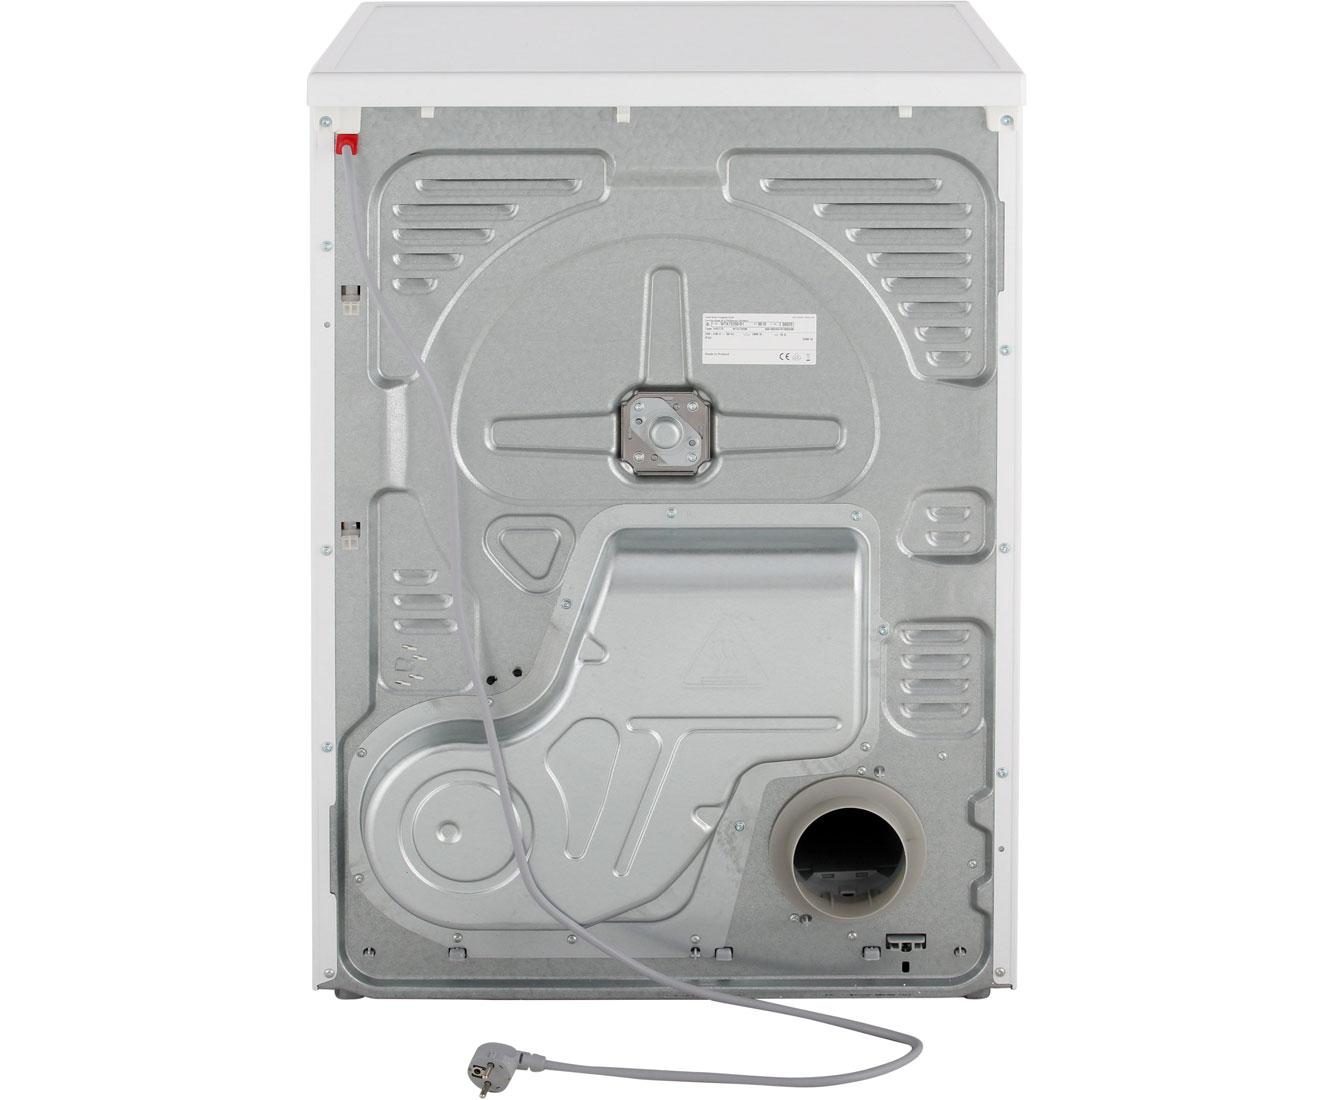 Bosch serie 4 wta73200 ablufttrockner 7 kg weiß